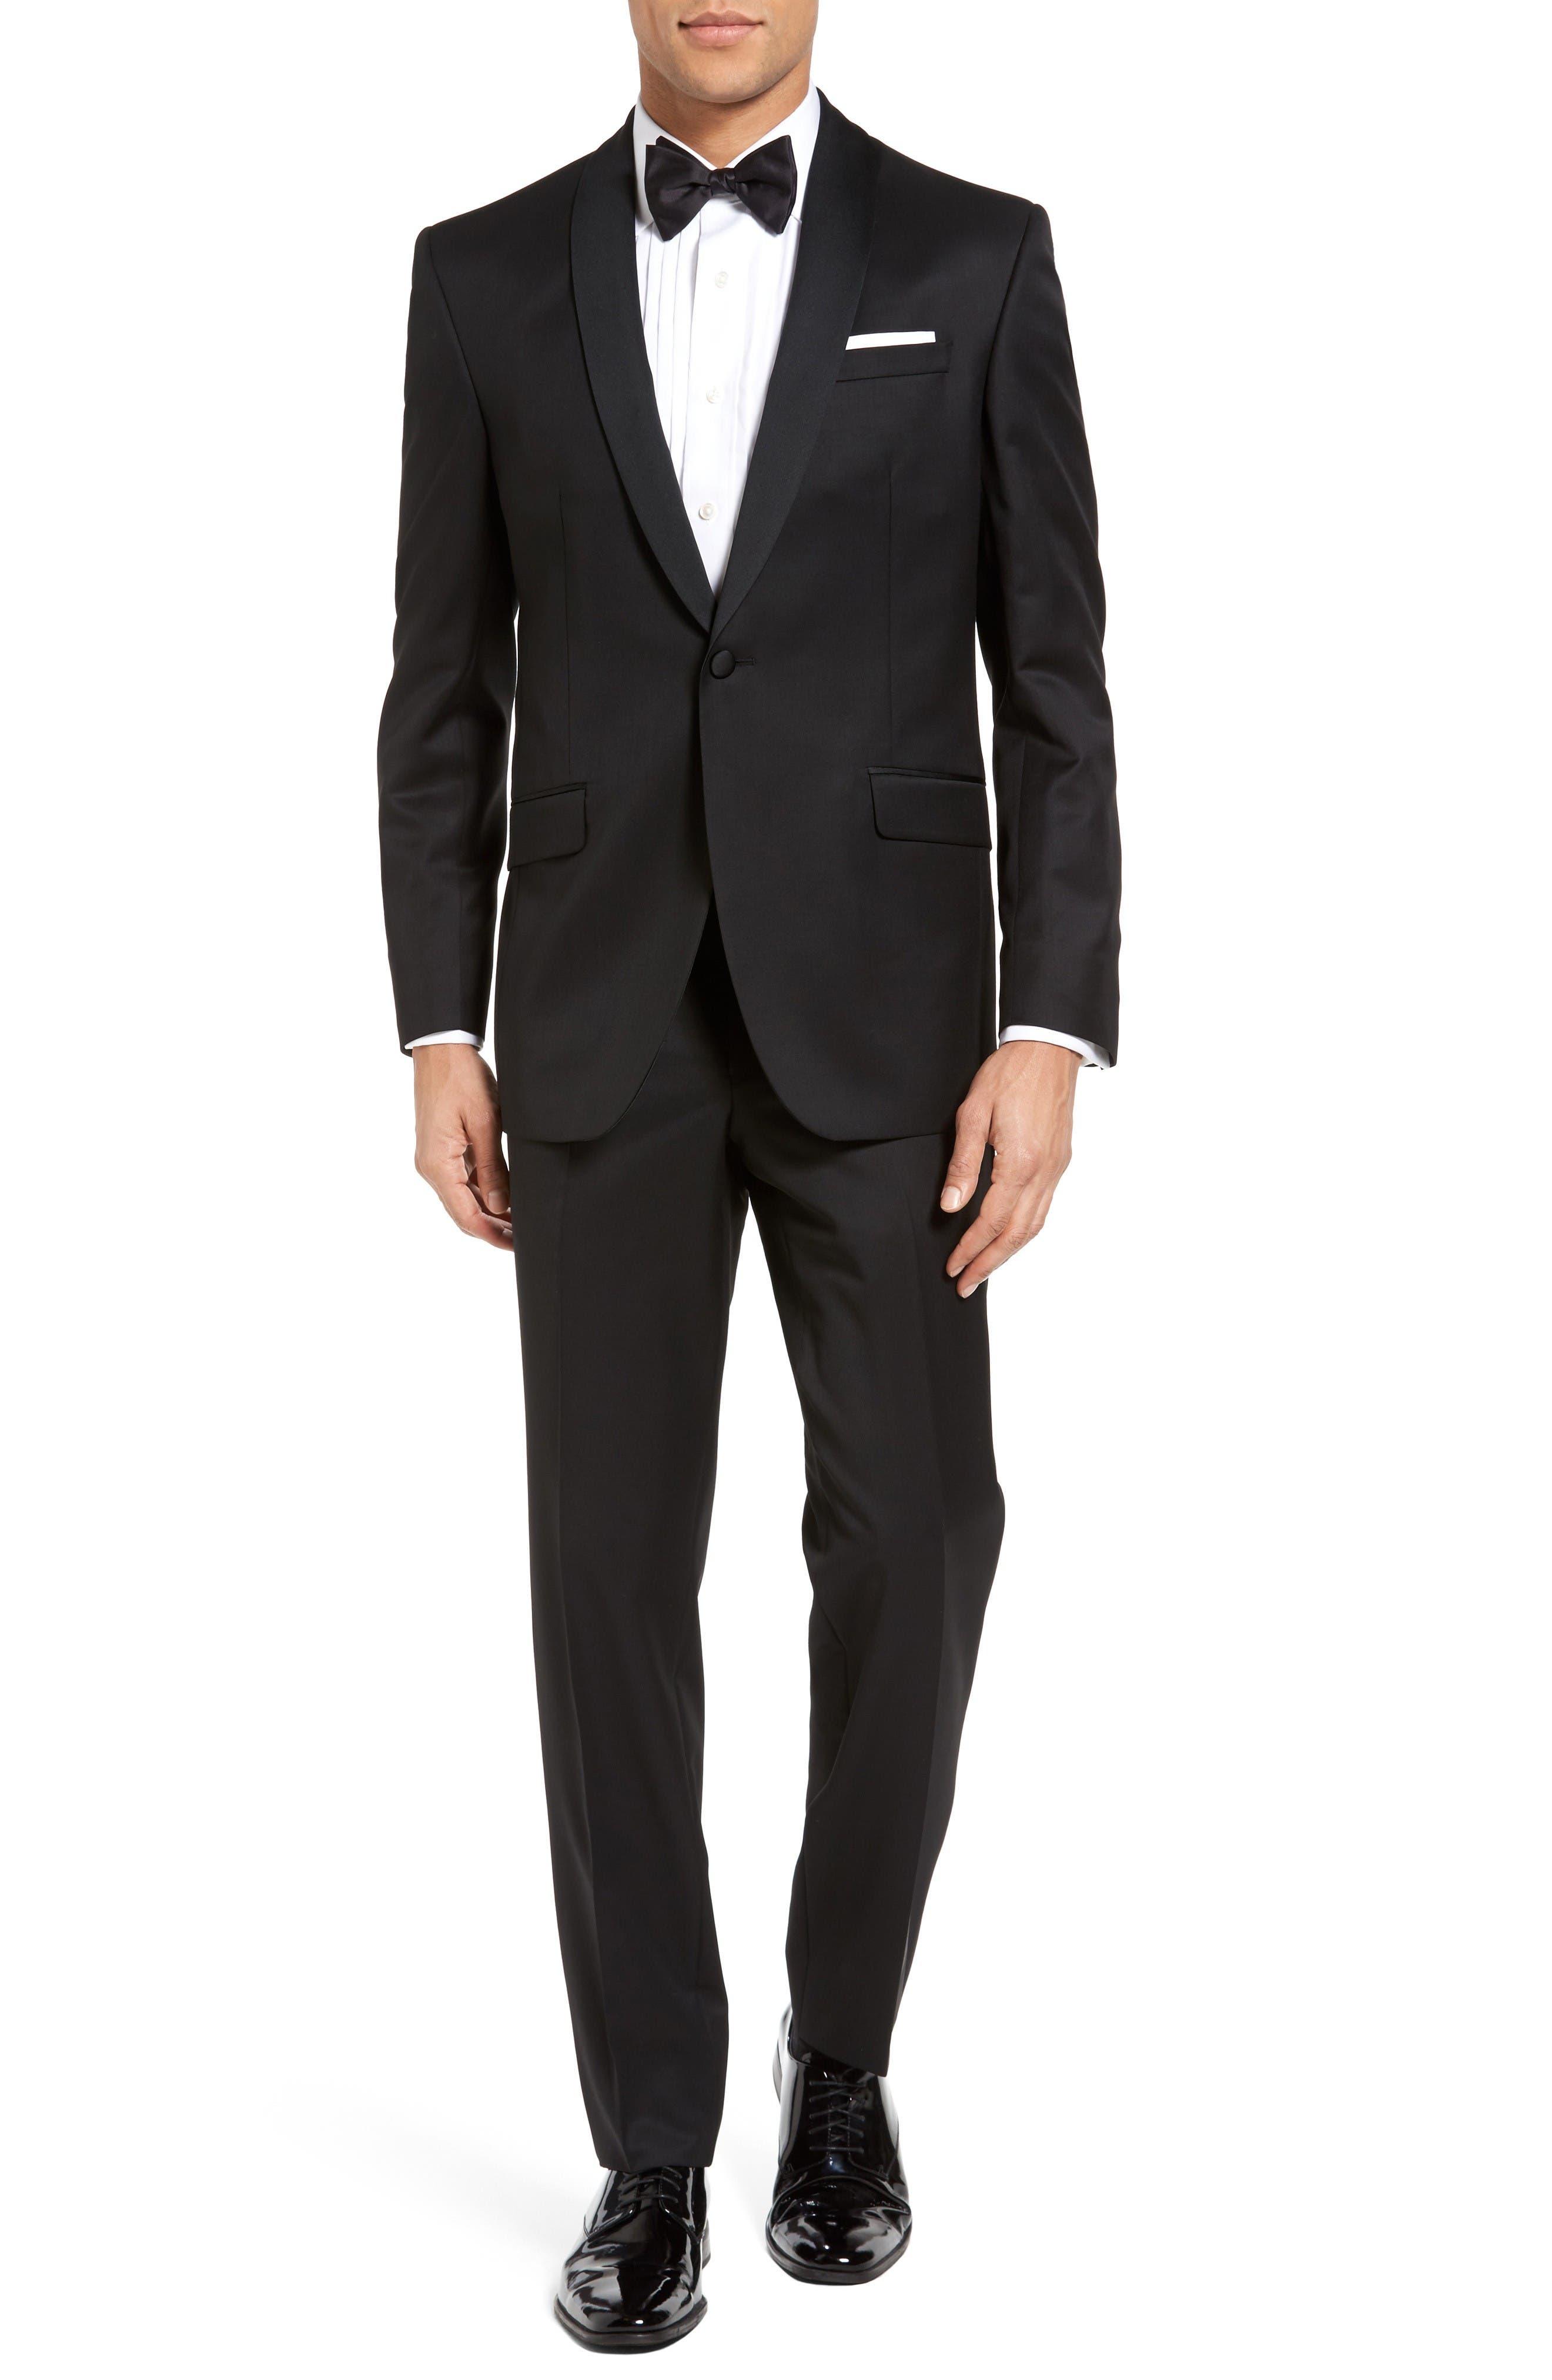 Men\'s Tuxedos: Wedding & Formal Wear